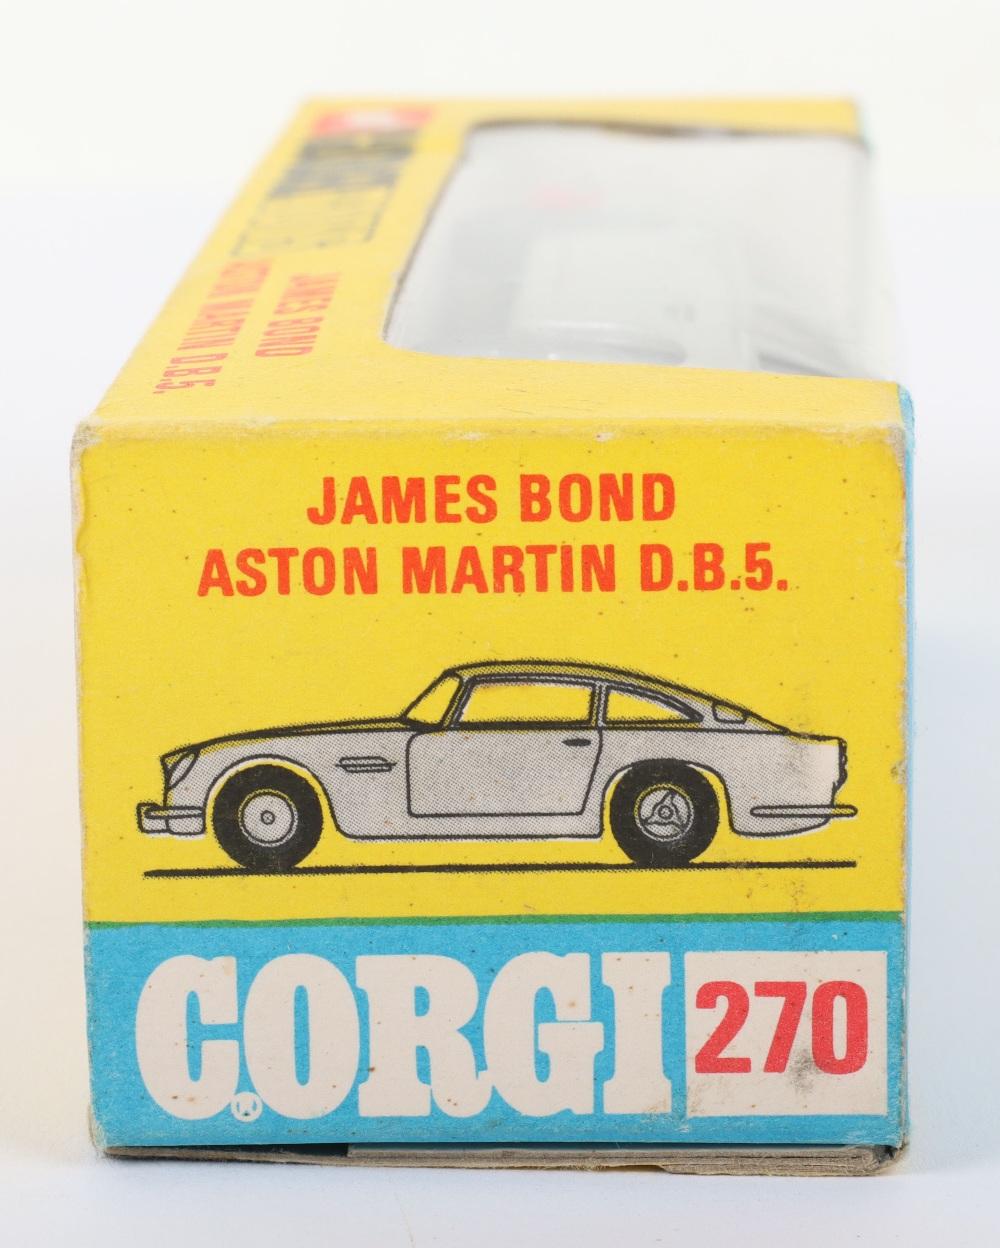 Corgi Toys 270 James Bond Aston Martin slim window box - Image 8 of 8